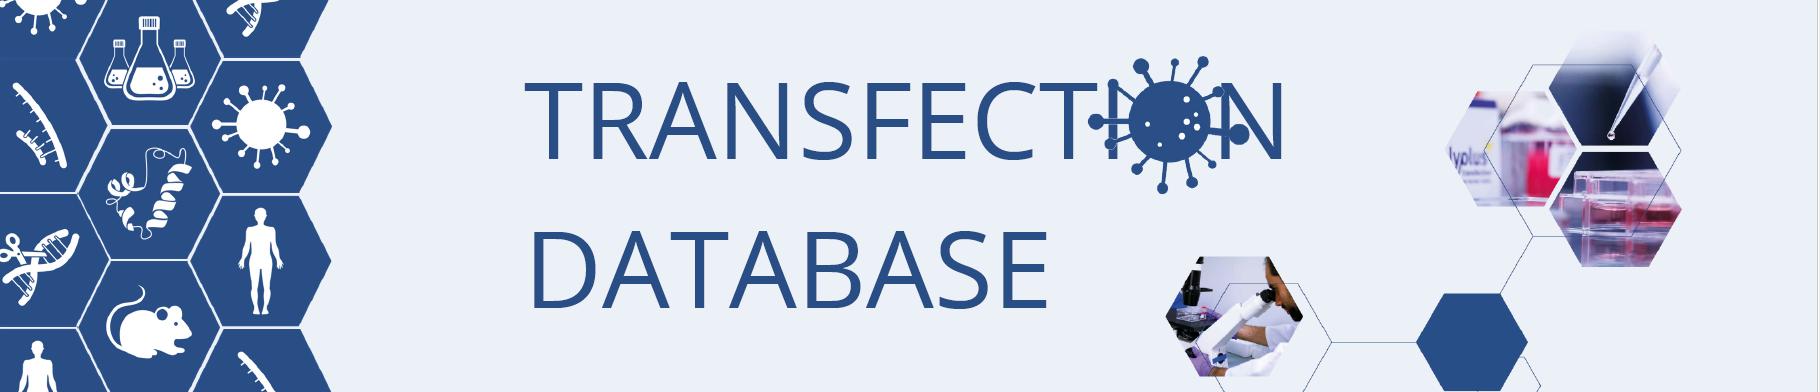 transfection database